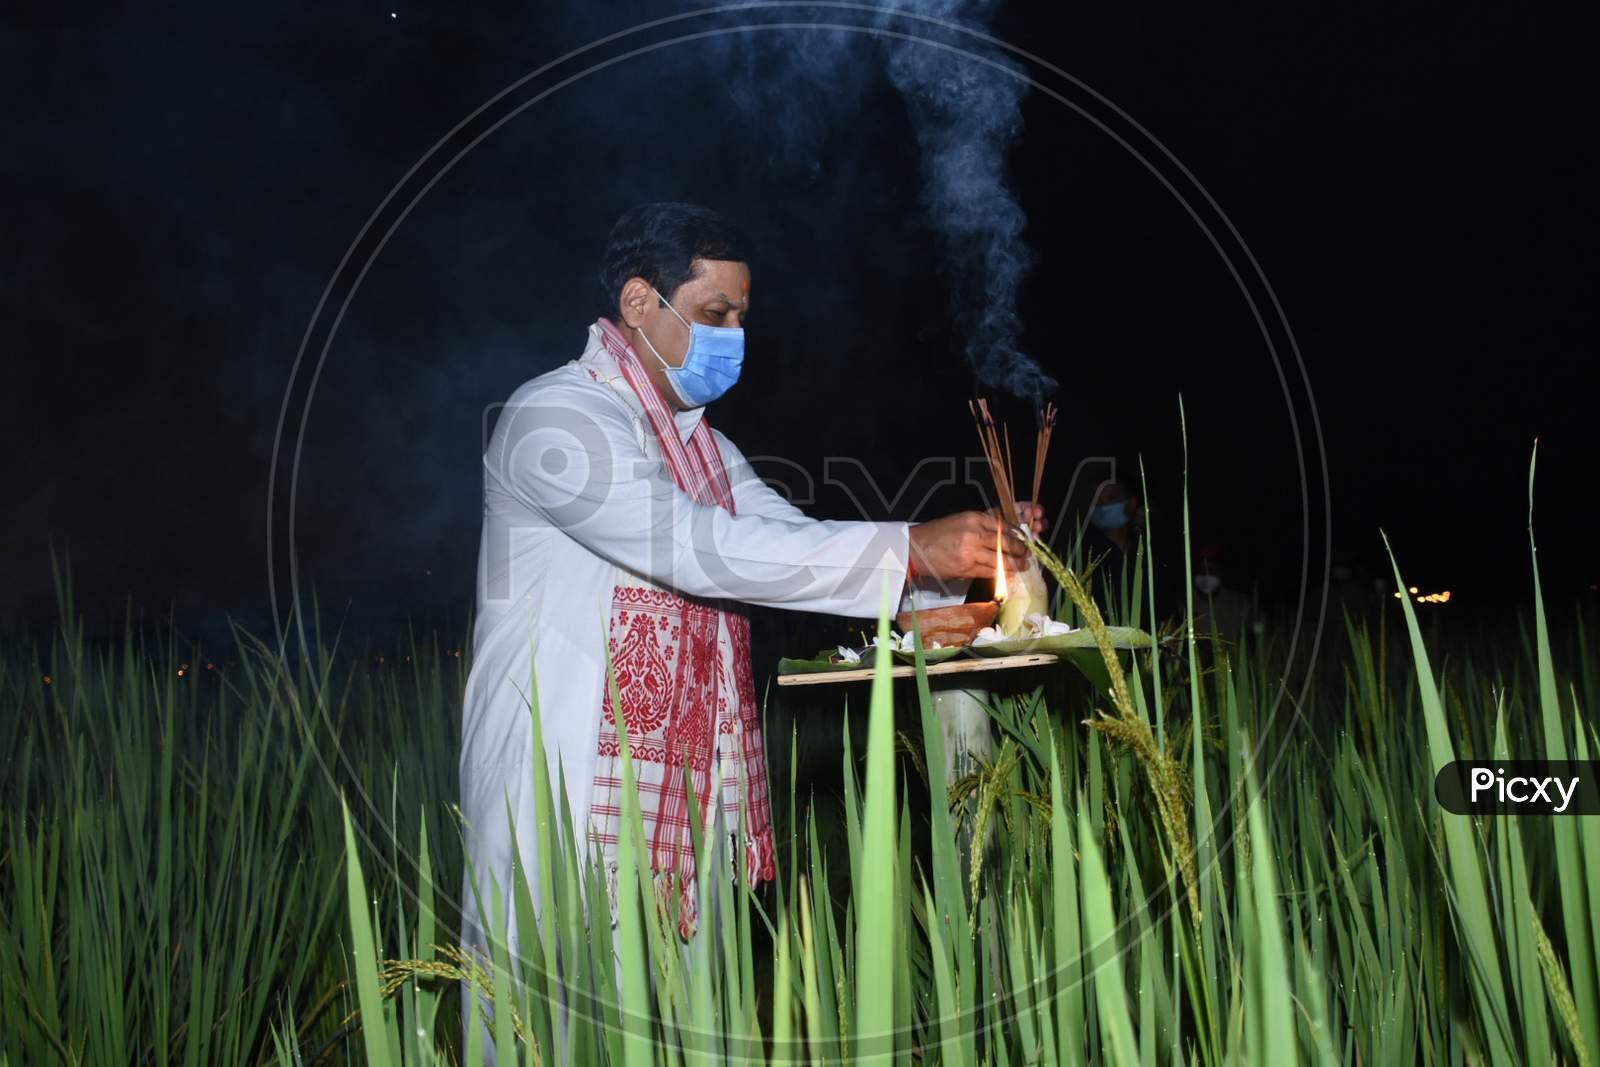 Assam Chief Minister Sarbananda Sonowal lighting akashbanti (earthen lamp) at a paddy field on the occasion of Kati Bihu at Bamunpara Monpur Pathar in Mangaldoi, in  Darrang district of Assam on oct 17,2020.